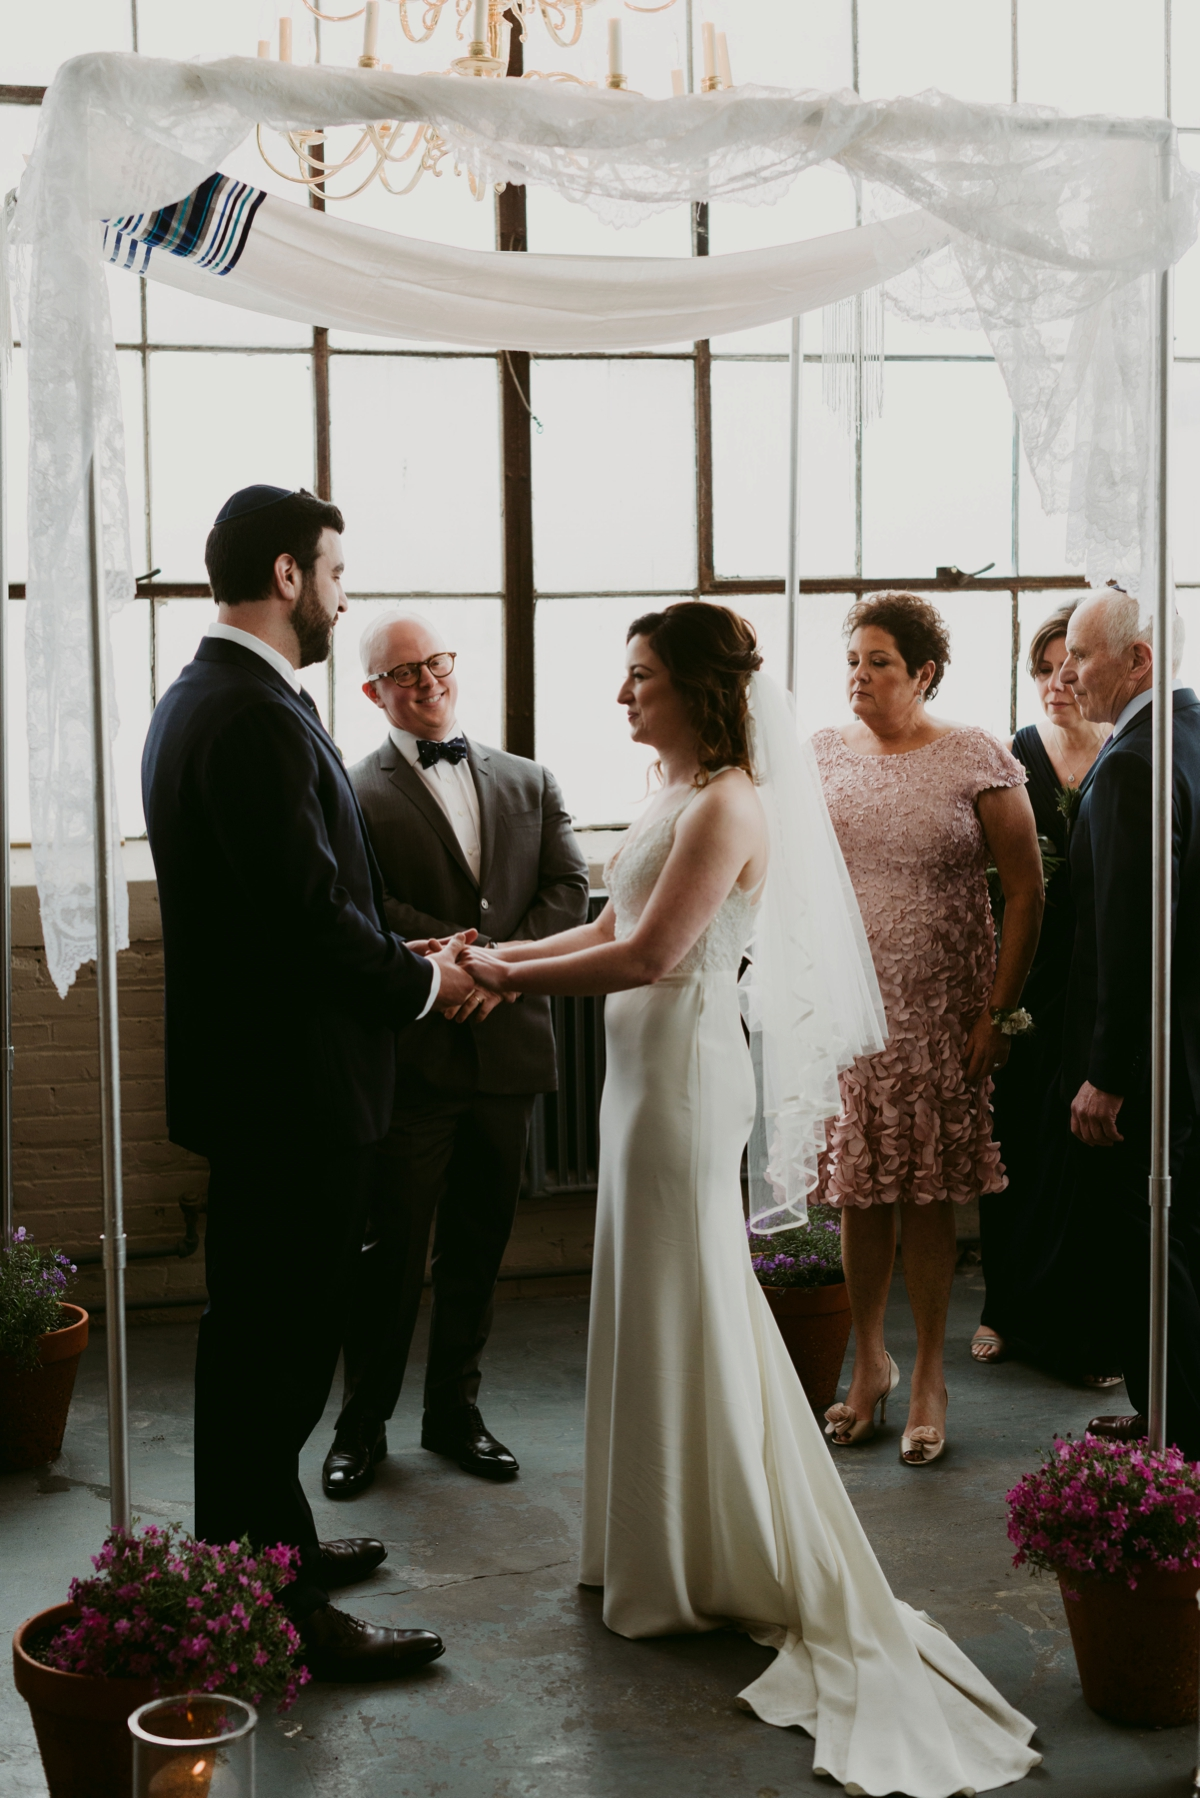 Rachel+Michael_Lake-Erie-Building-Cleveland-Wedding_M+J-Photographers-785.jpg